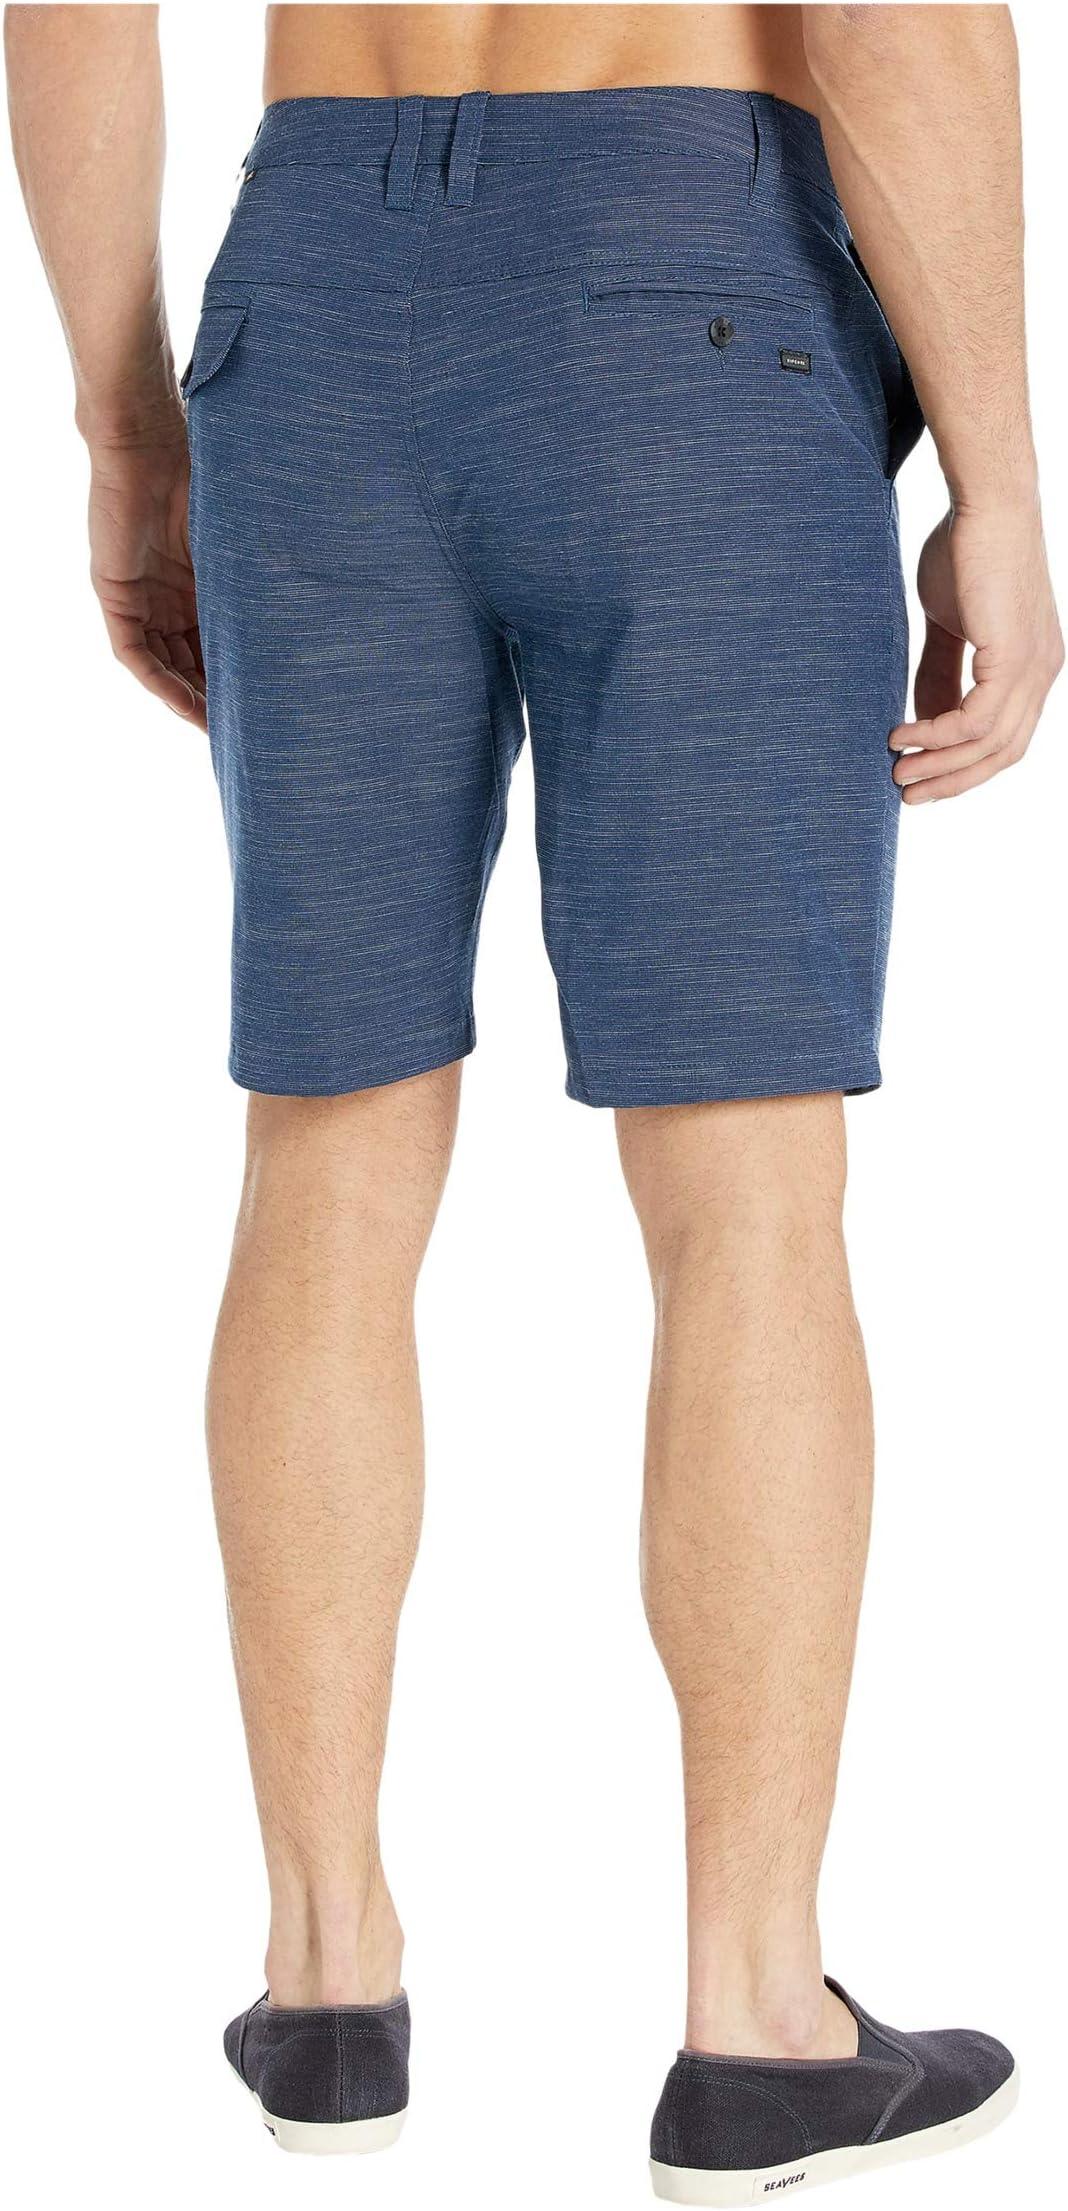 "Rip Curl 20"" Jackson Boardwalk Shorts o5res"